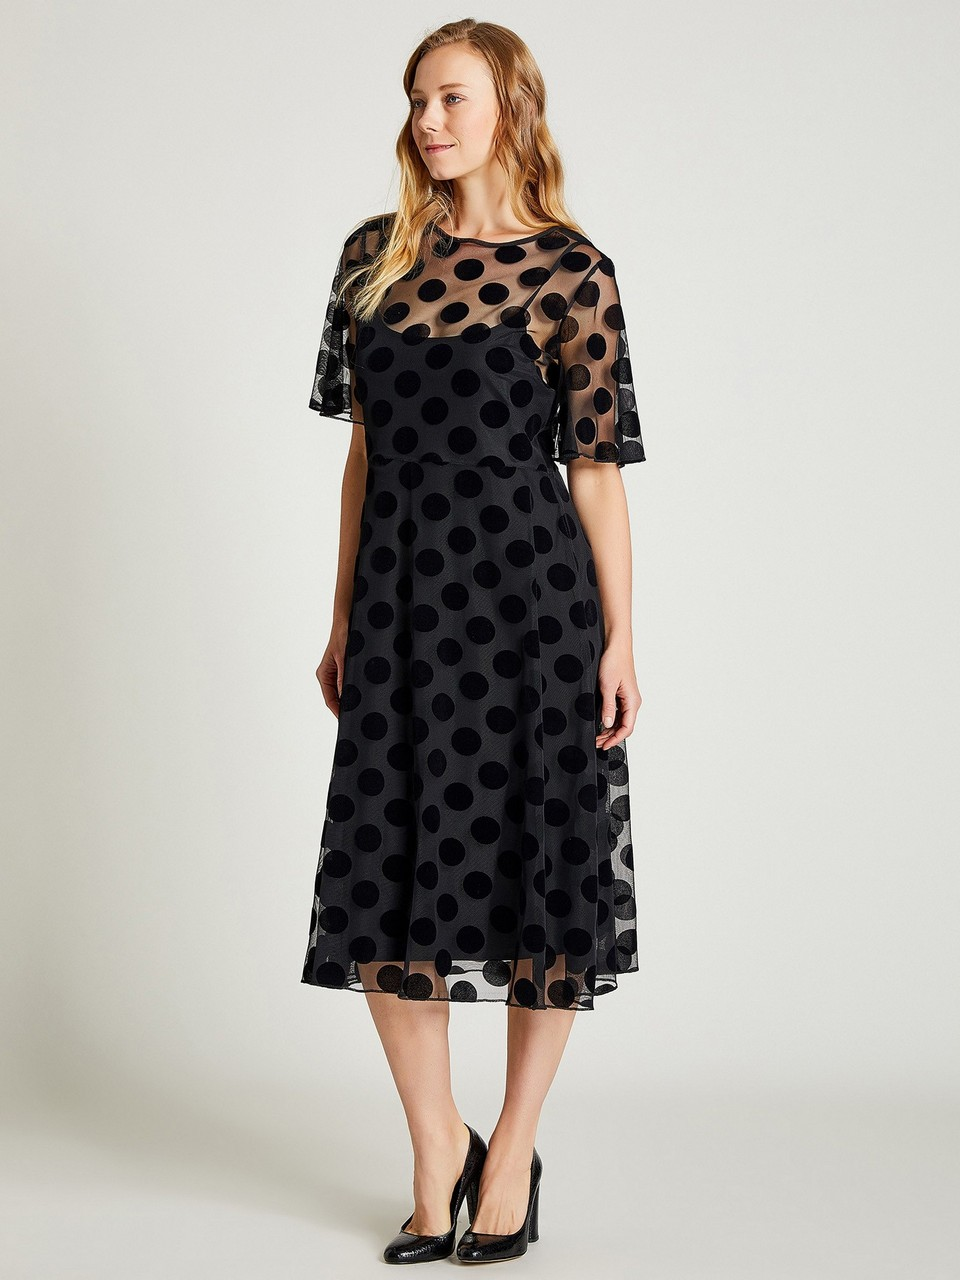 Chiffon Dress with Polka Dot